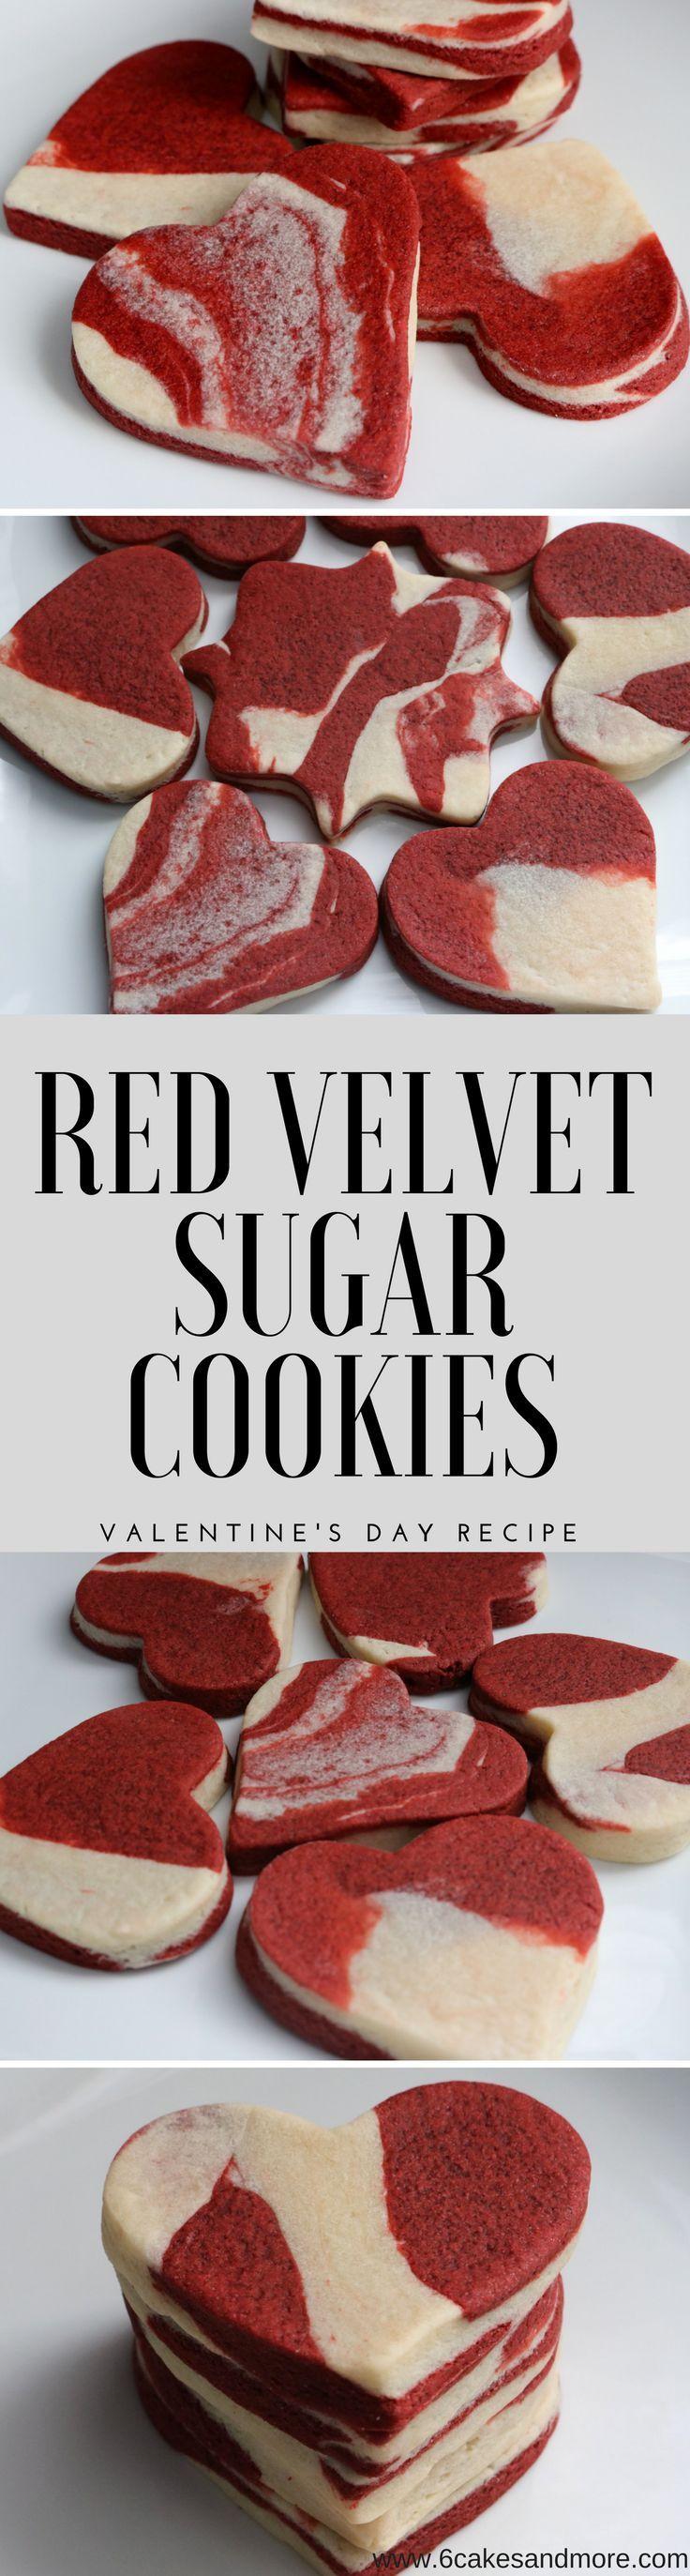 No Chill No Spread Red Velvet Sugar Cookies! #redvelvet #redvelvetsugarcookie #valentinesday #valentinesdaytreat #nochillcookie #nospreadcookie #cookietrend